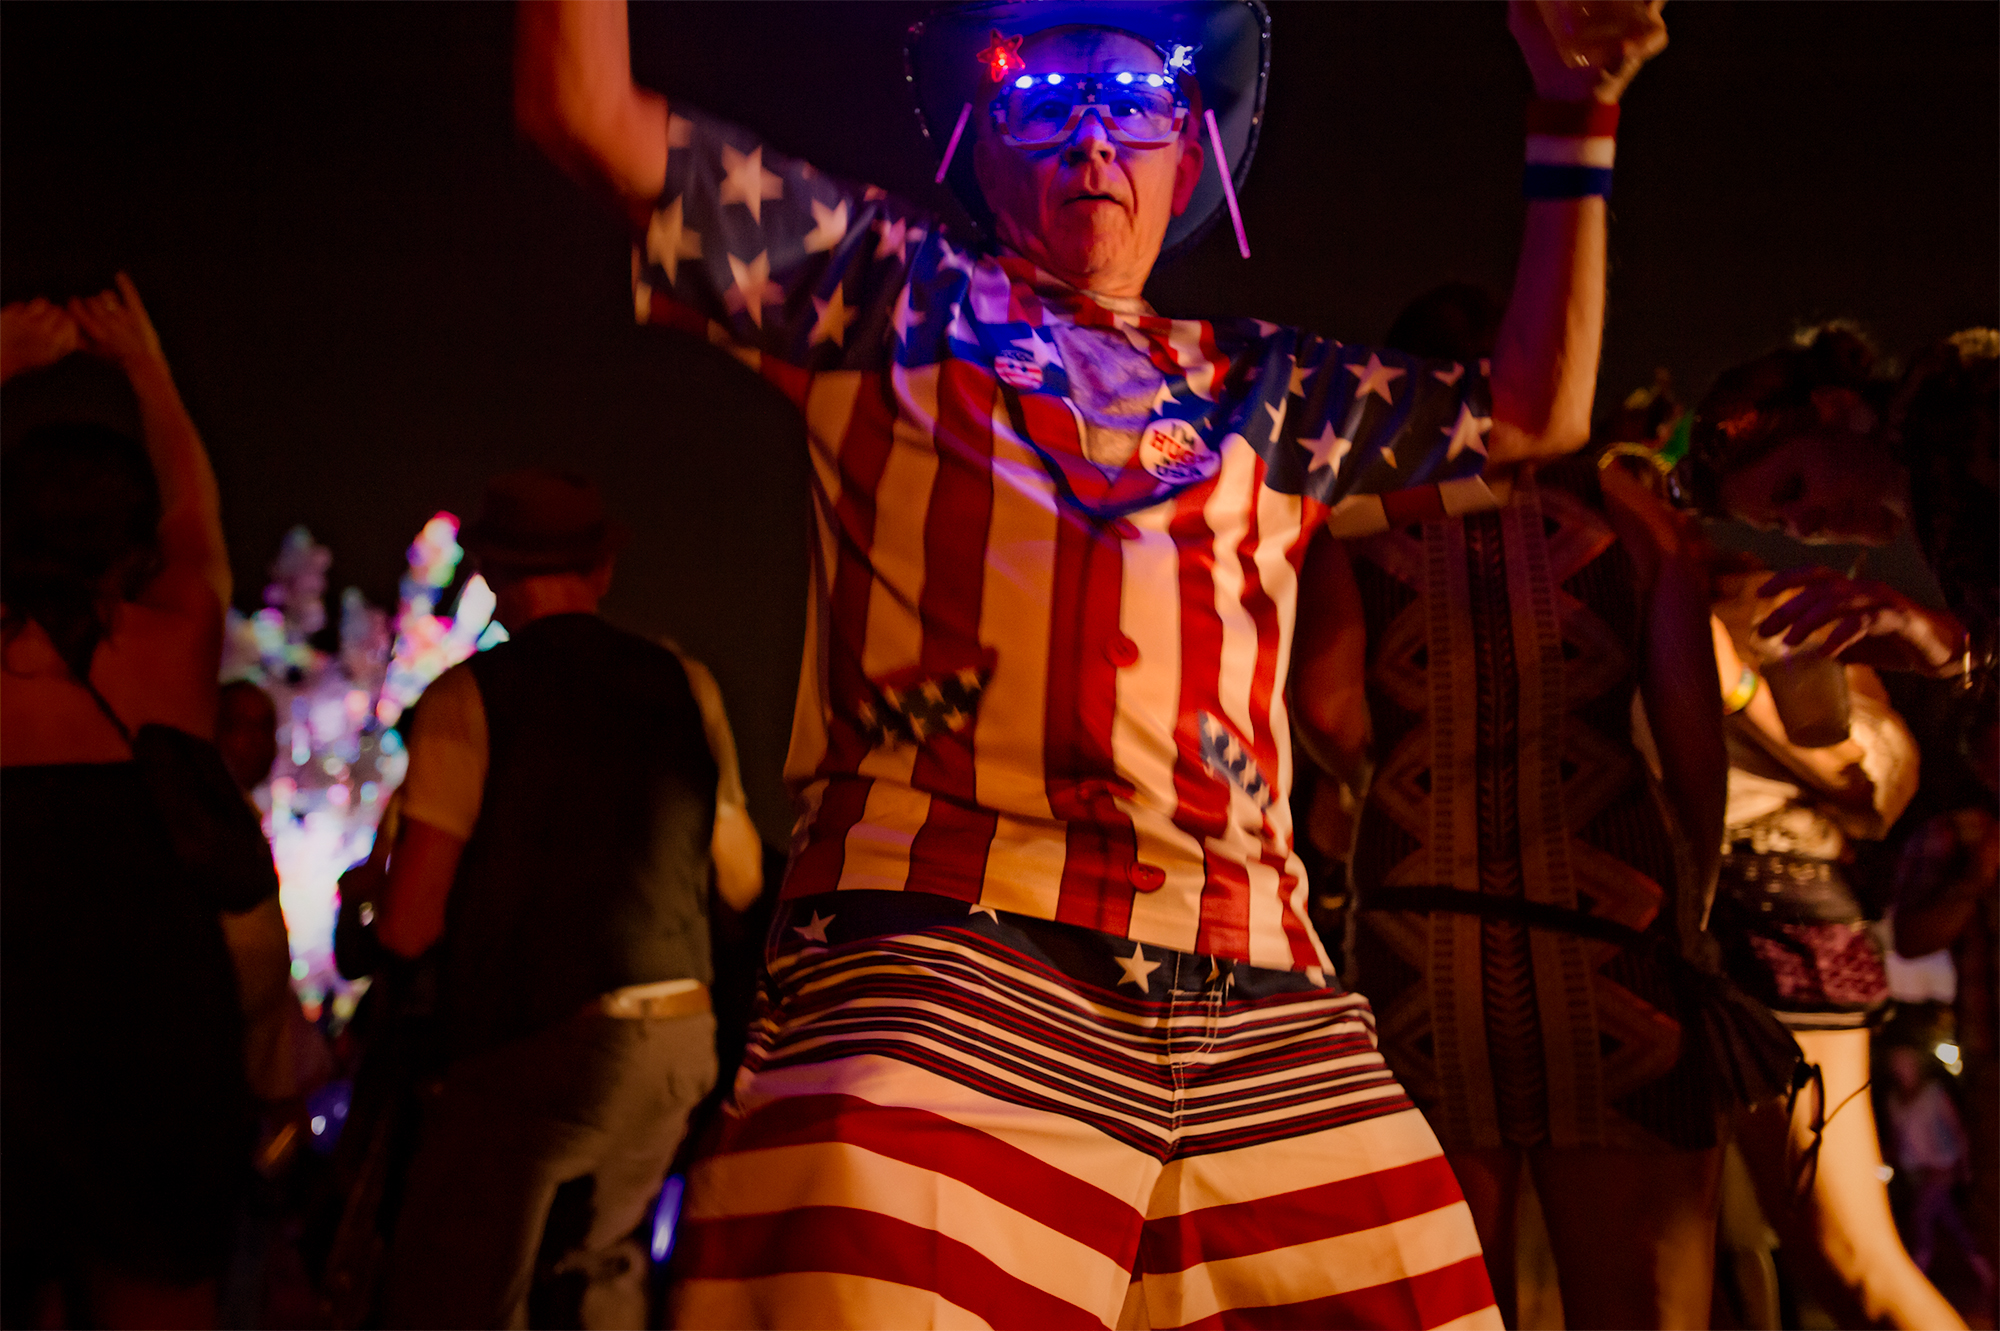 Burning Man at the Hermitage